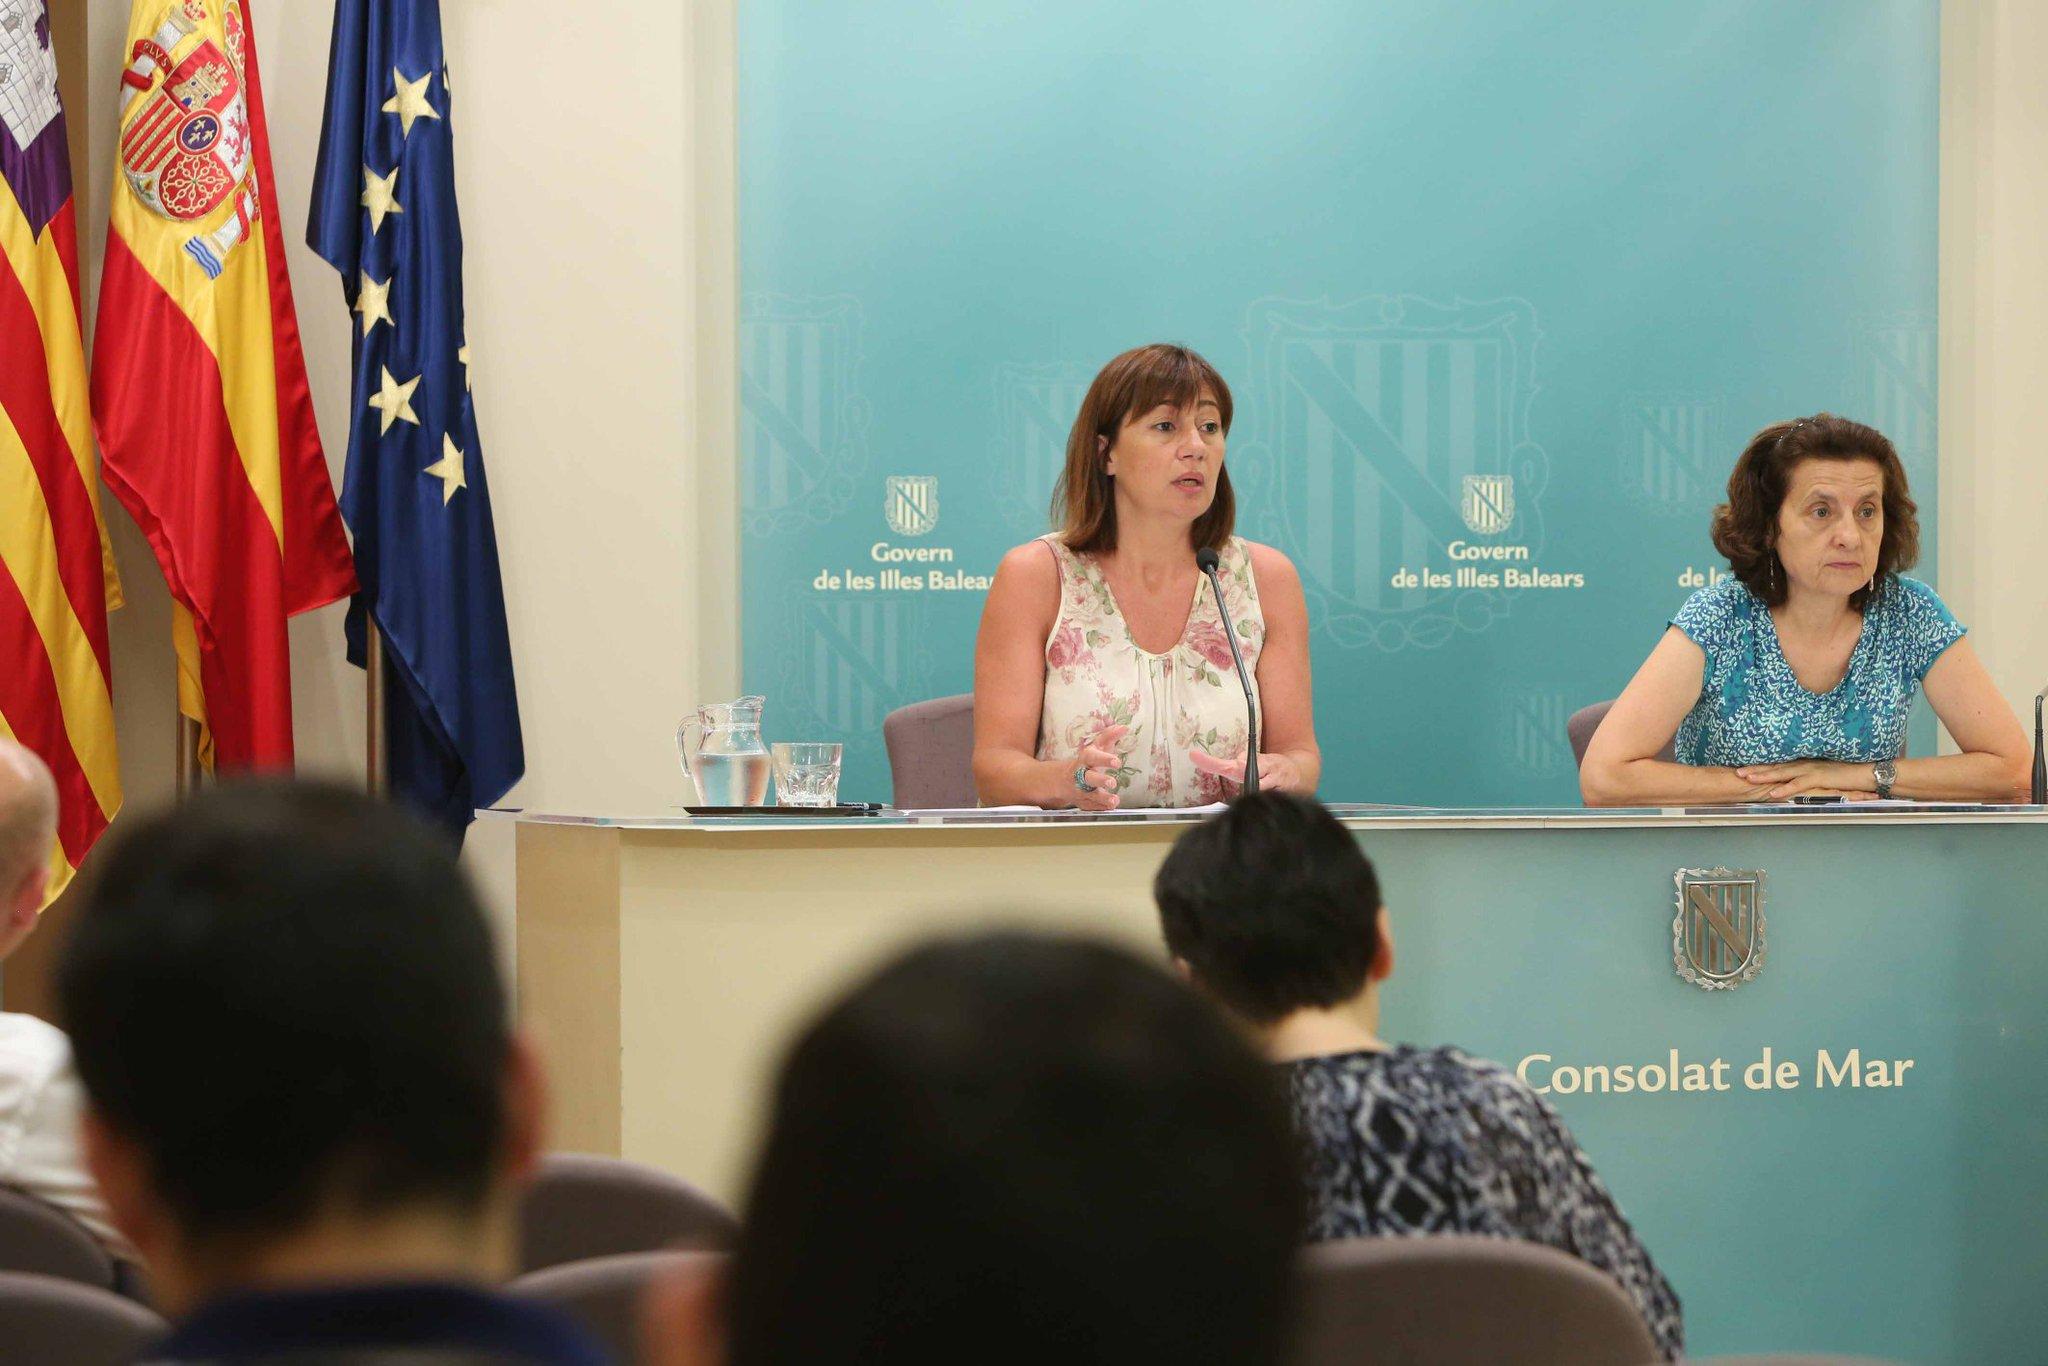 Un total de 406 personas ya cobra la renta social garantizada en Baleares